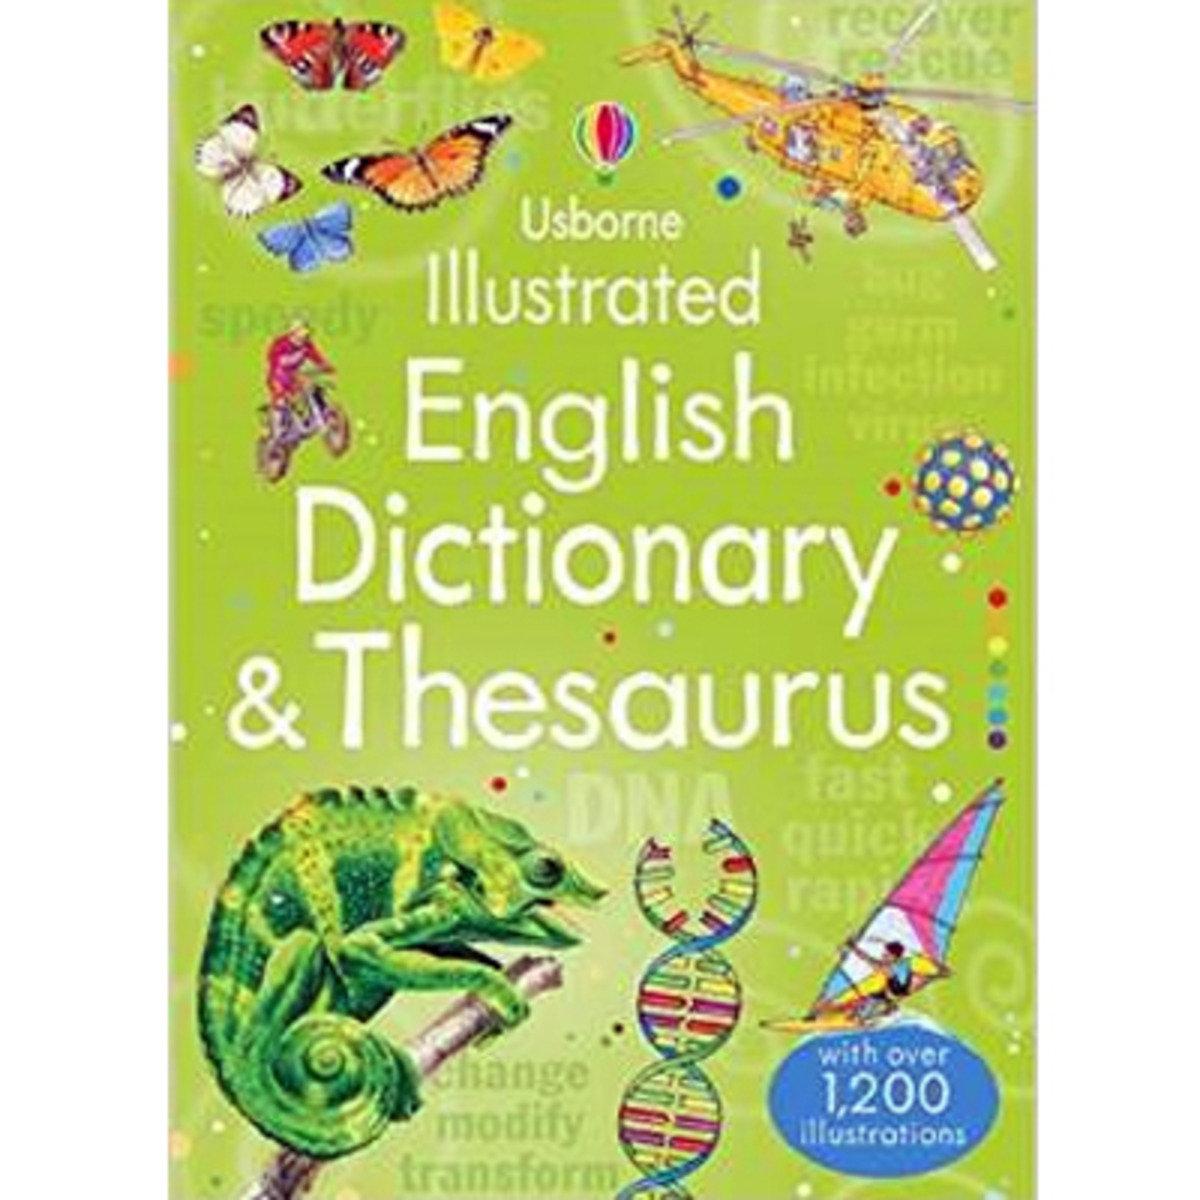 ILLUSTRATED ENGLISH DICTIONARY & THESAURUS 9781409584360